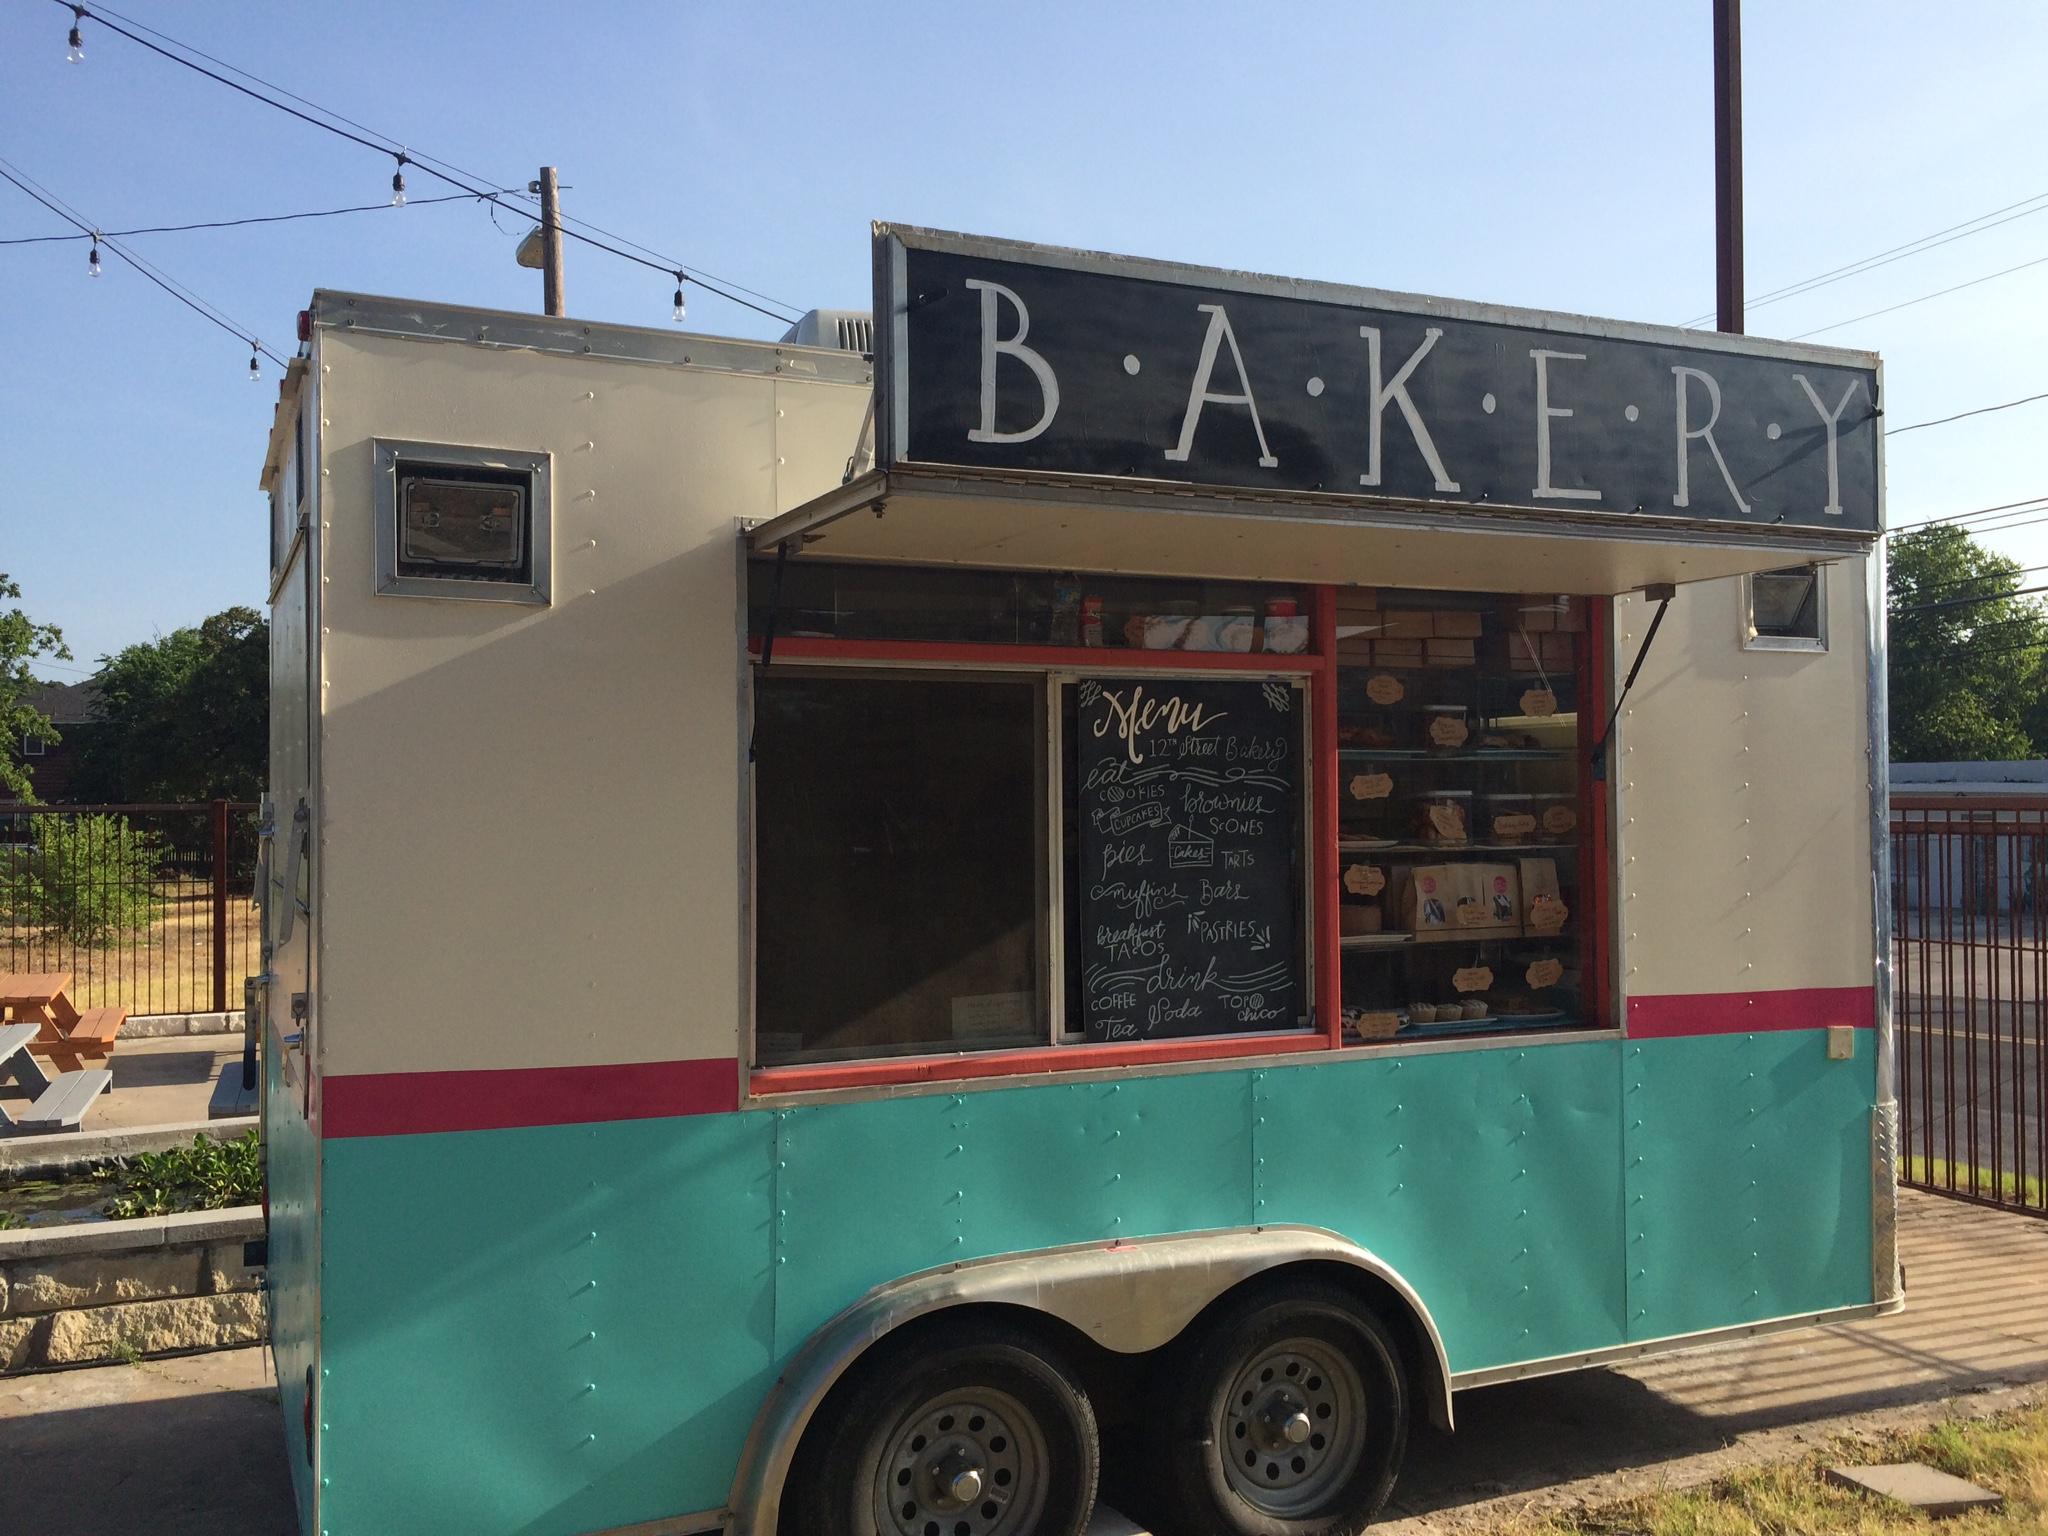 12th Street Bakery